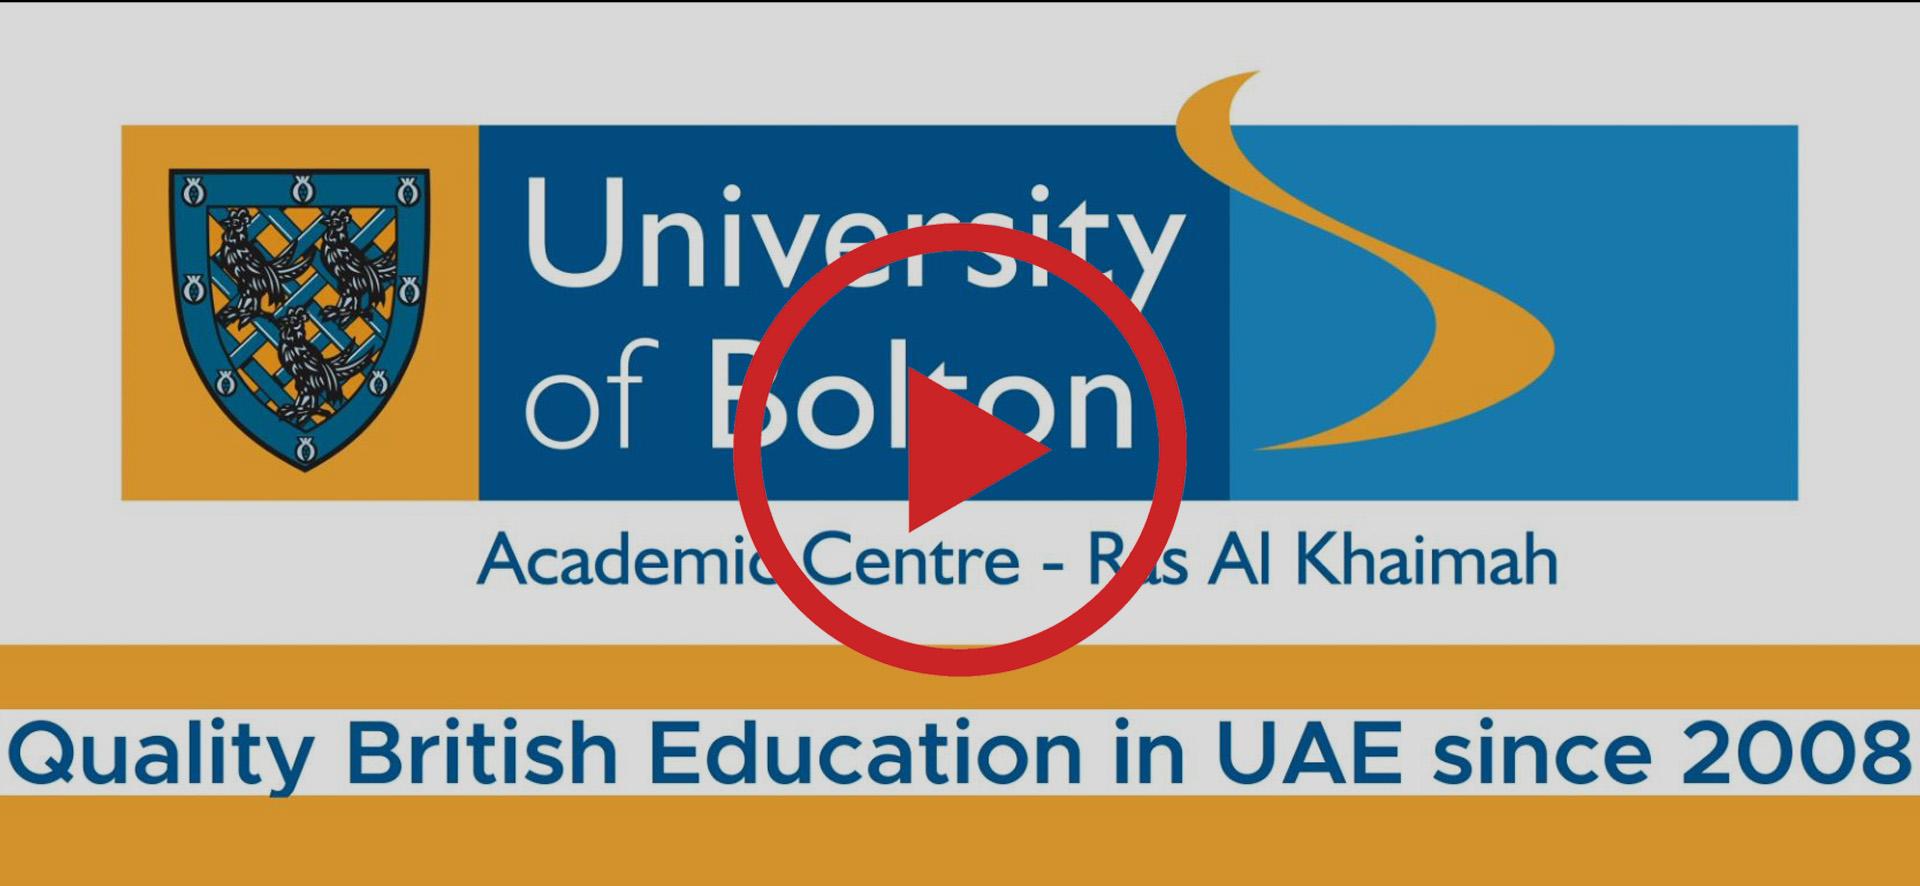 university of bolton-thub